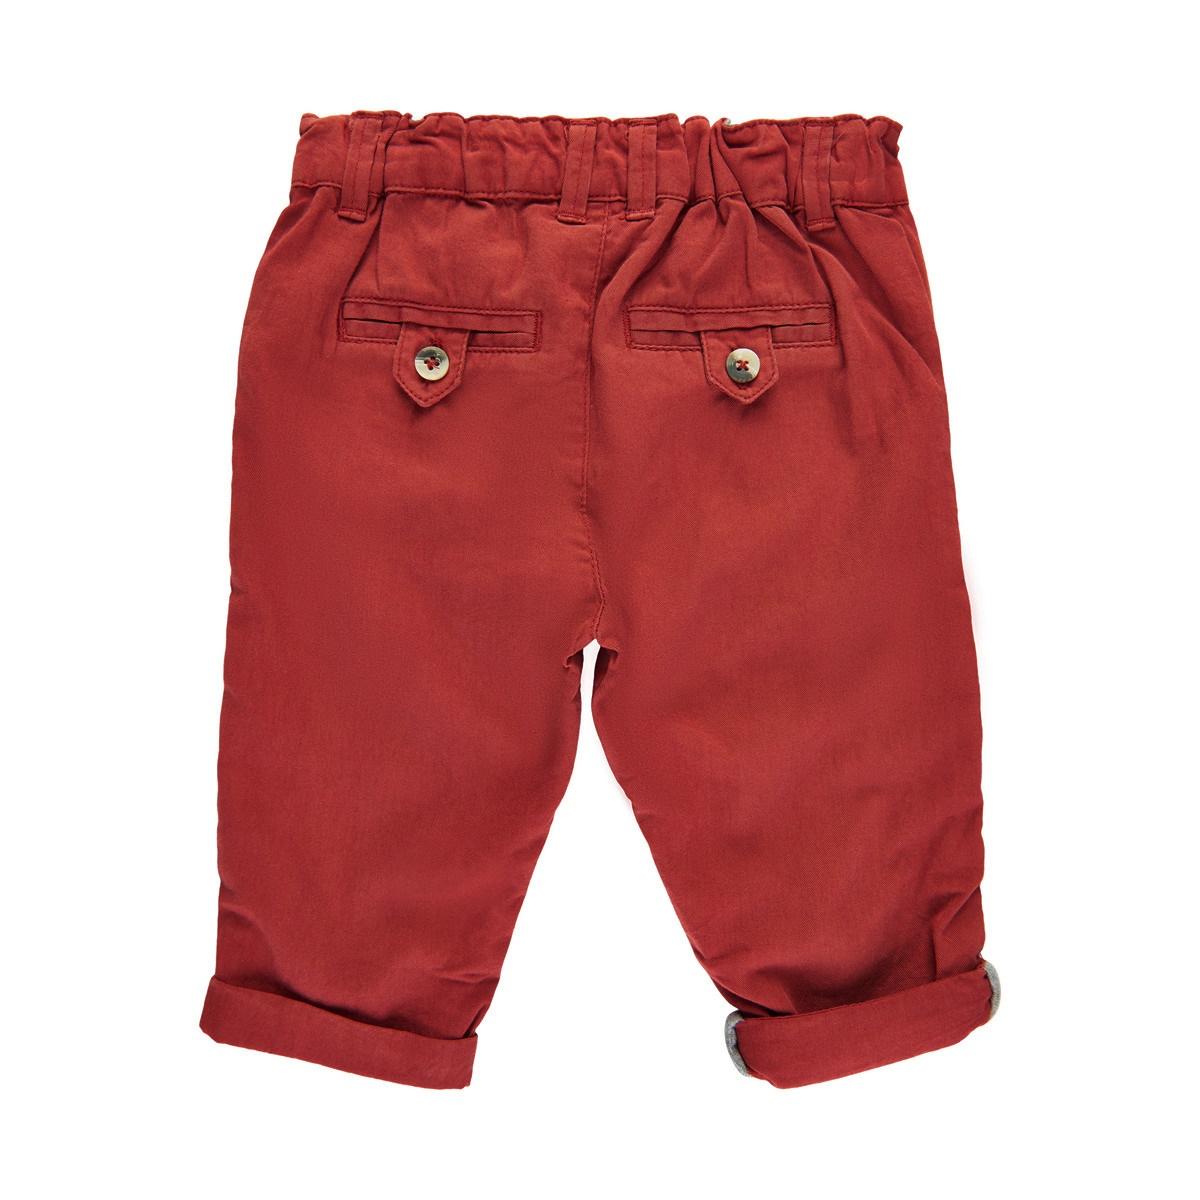 Noa Noa miniature Chinos bukse, tandori DressMyKid AS